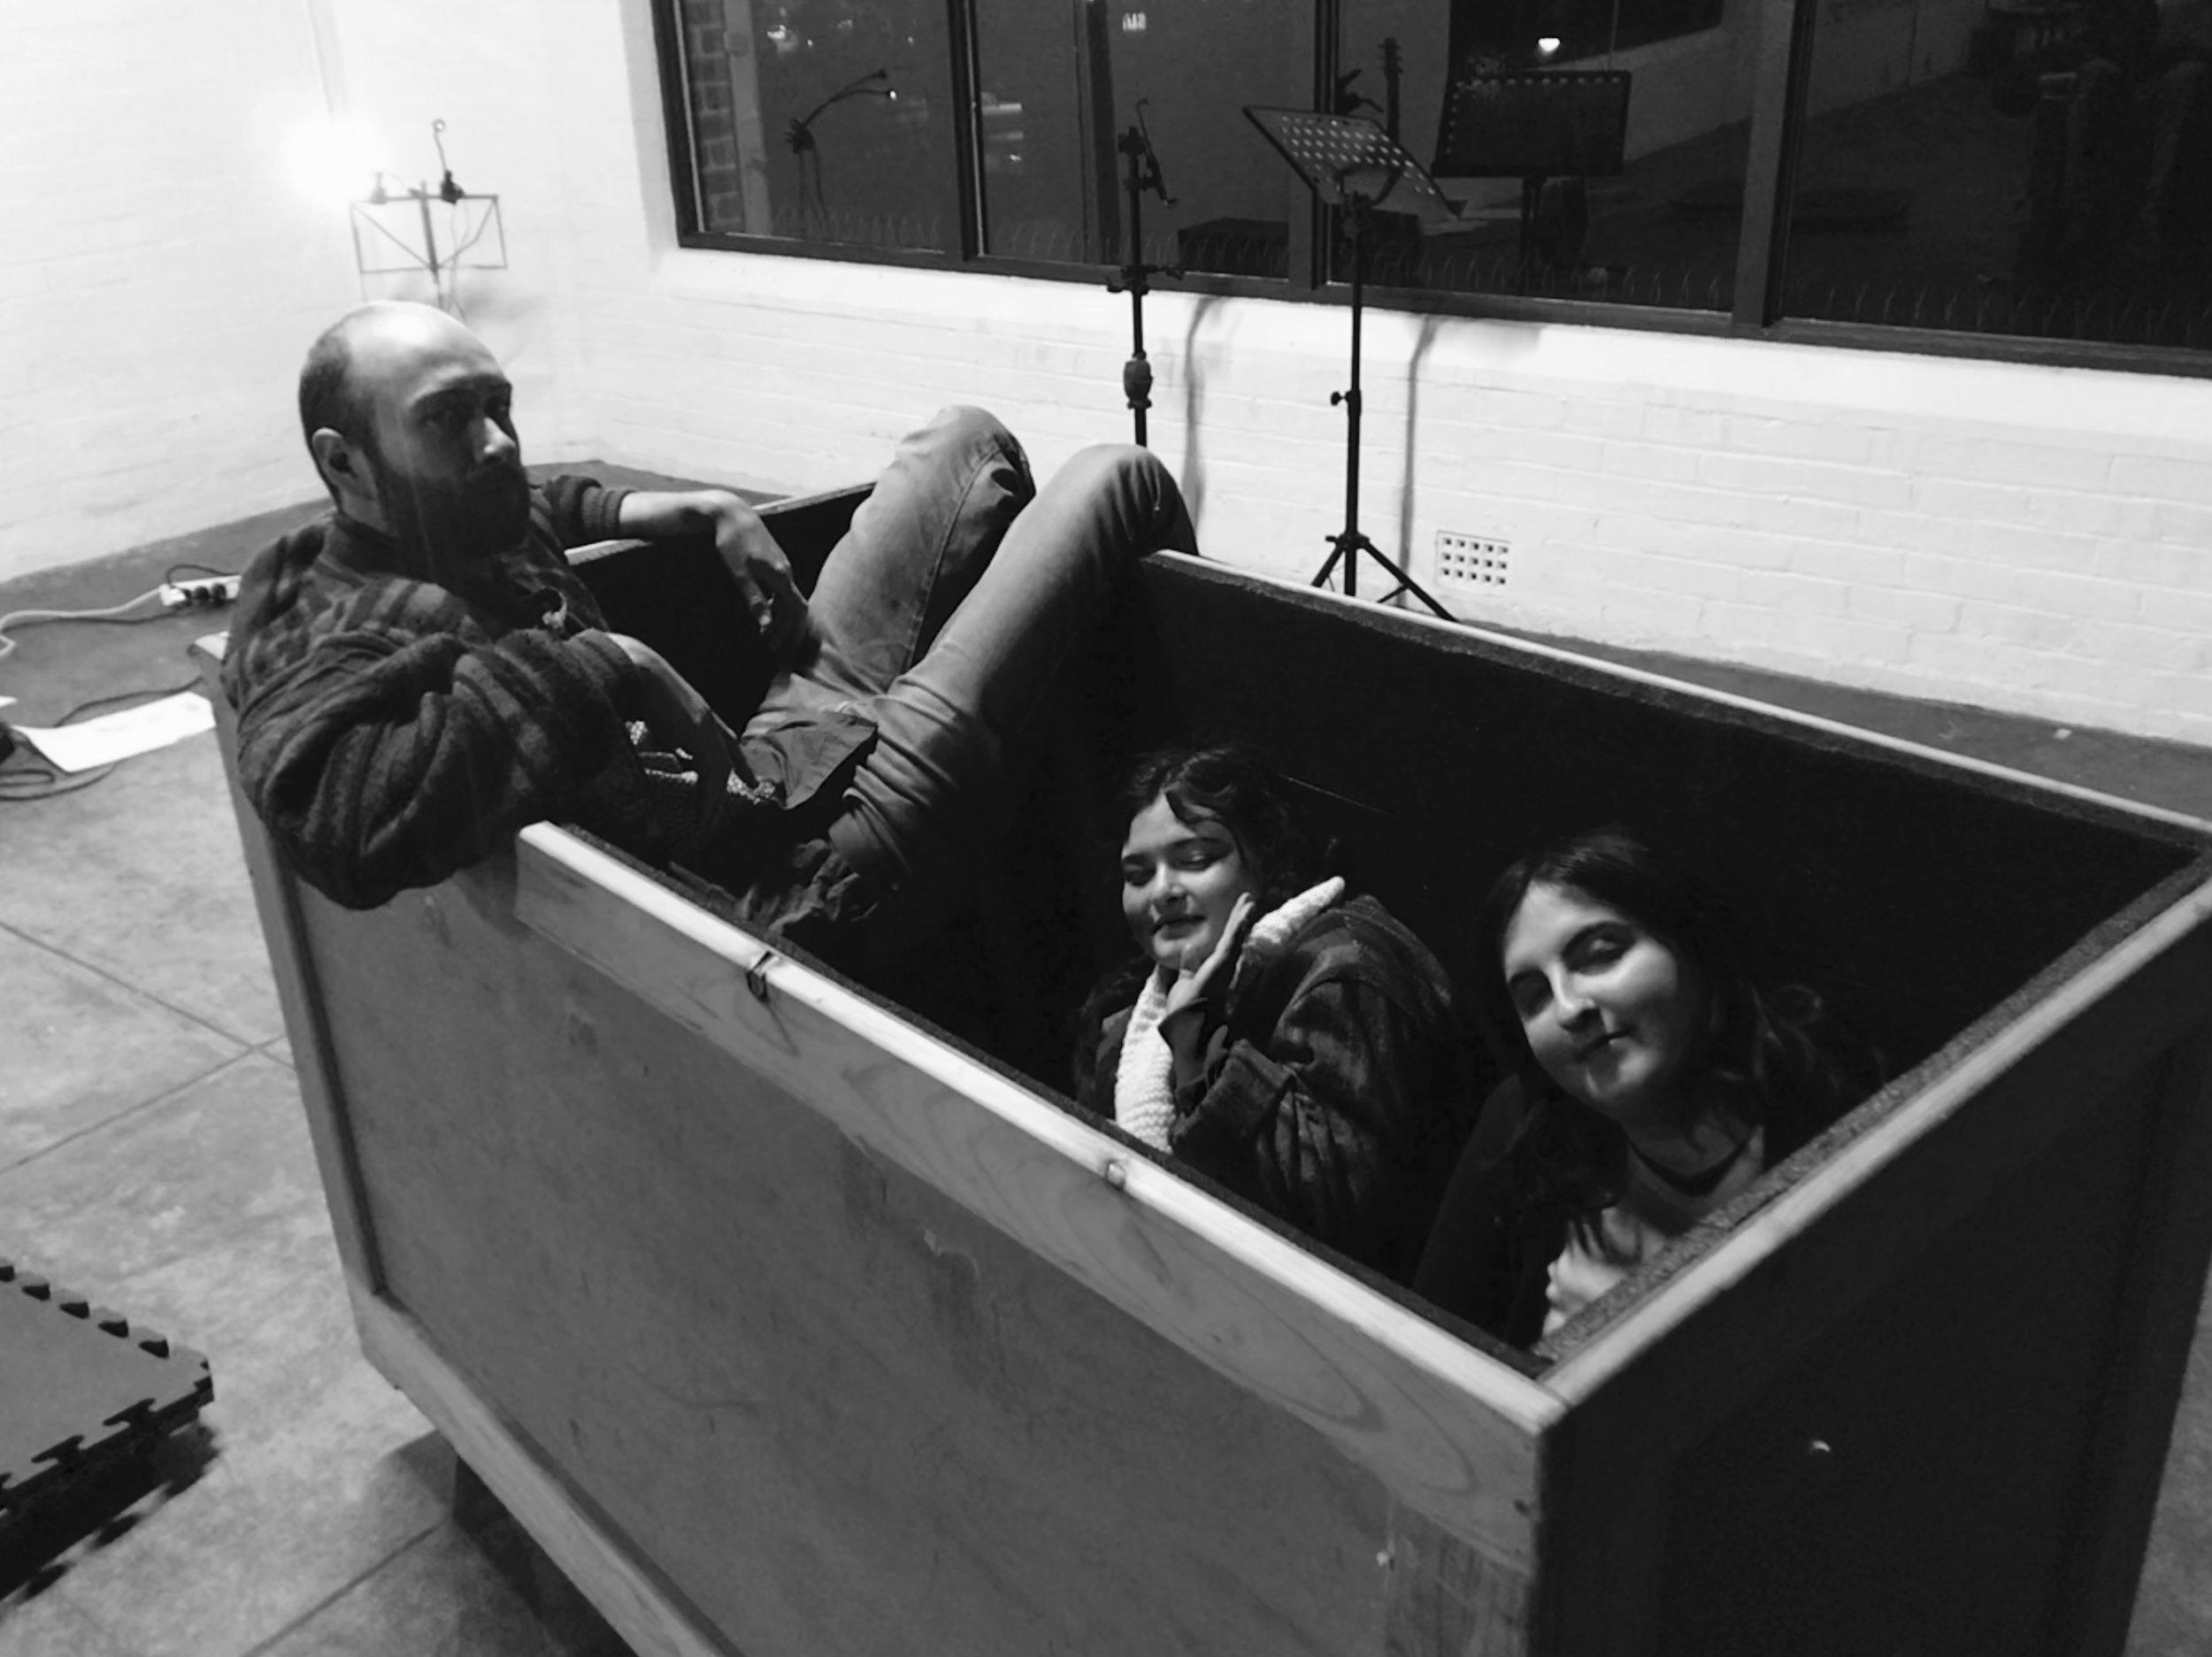 Joe, Jasmin and Jassy enjoying a soundbath.